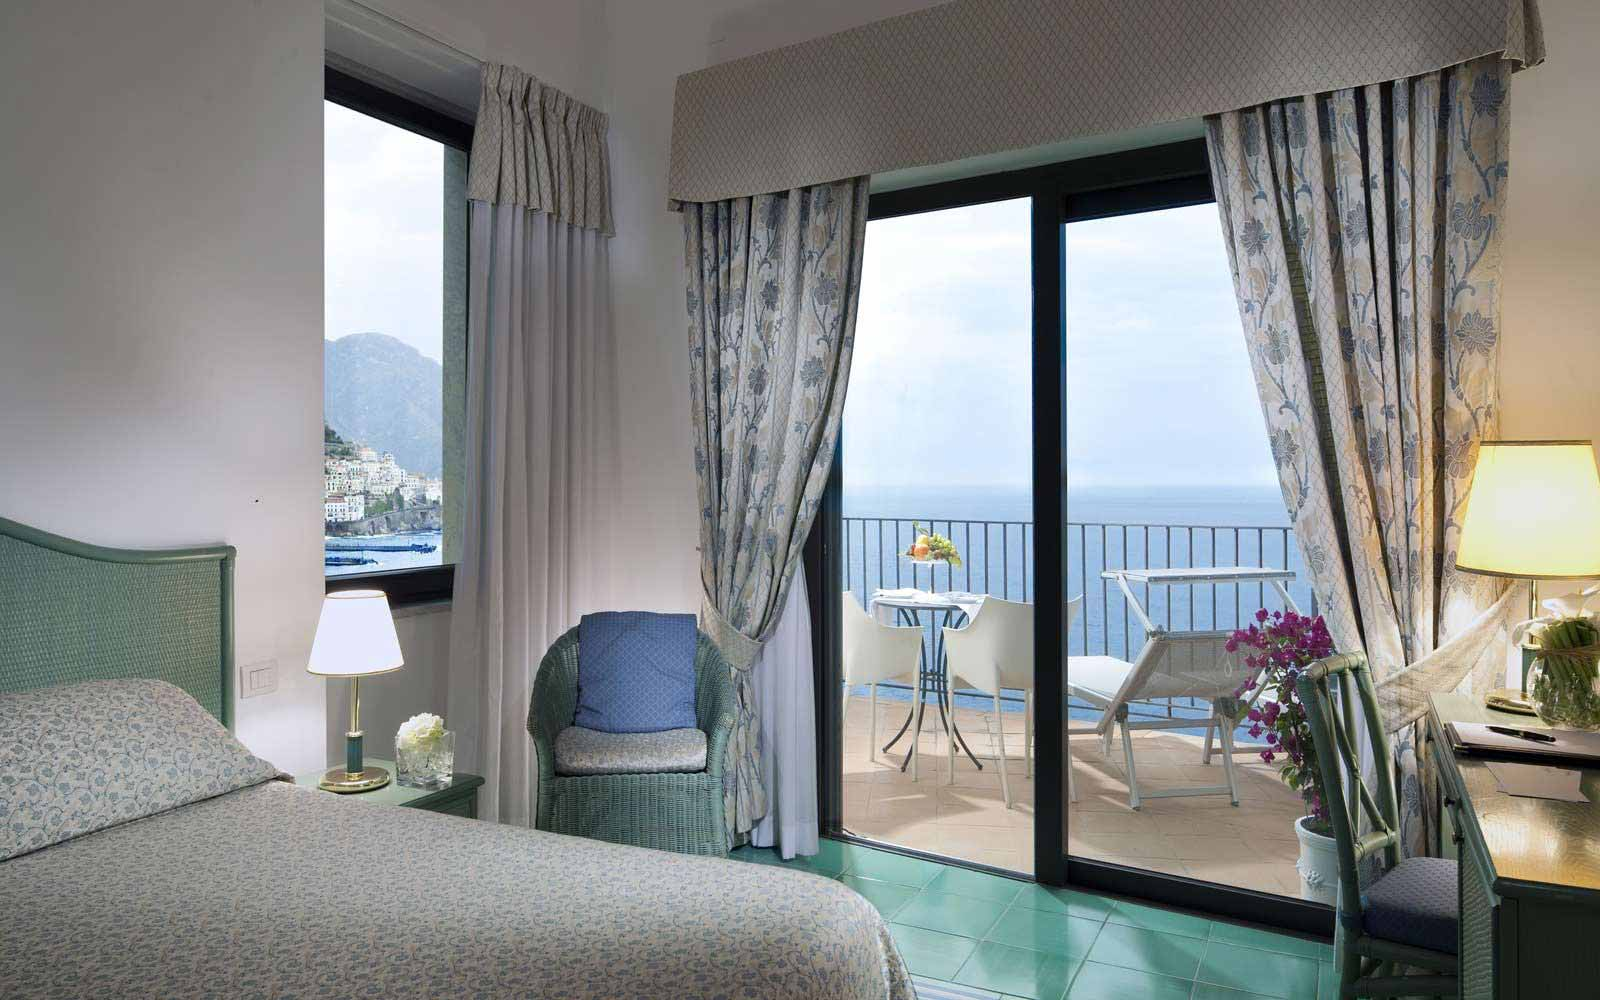 Superior room at Hotel Miramalfi